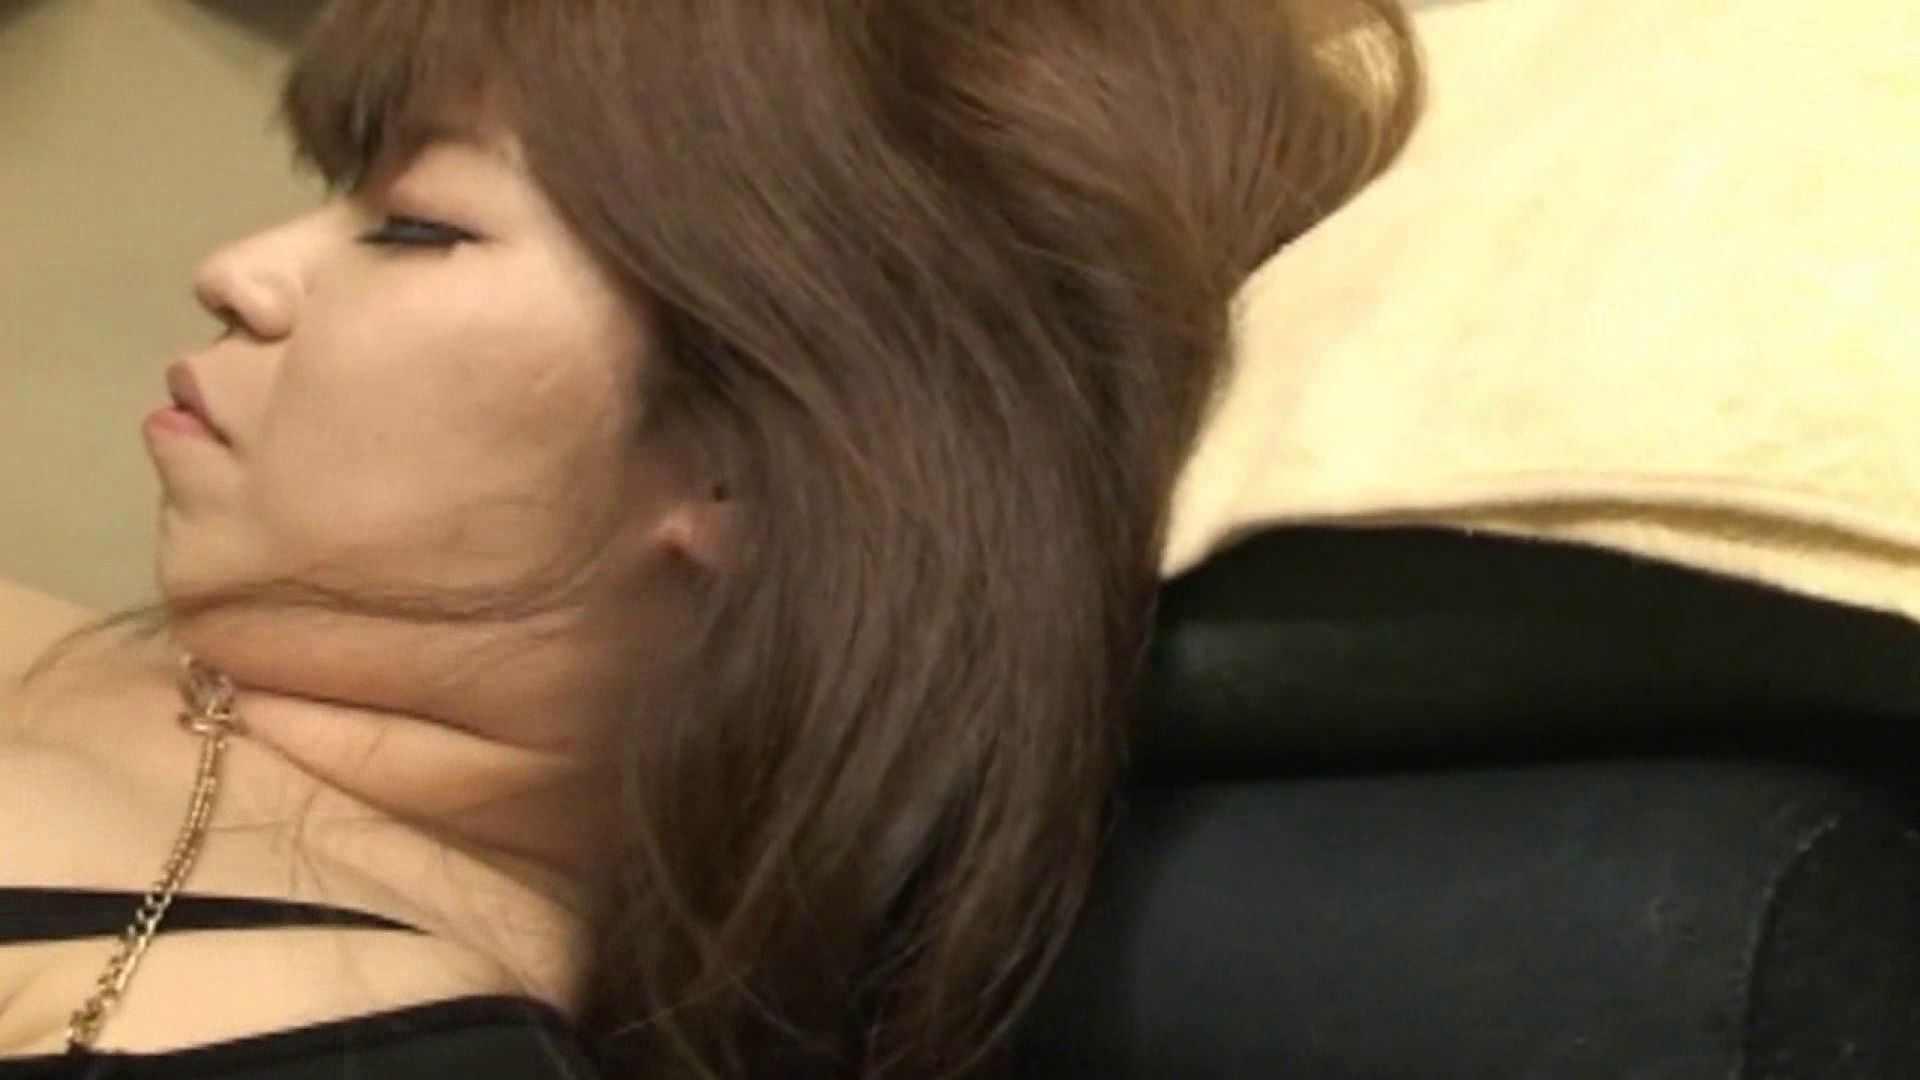 S級厳選美女ビッチガールVol.15 美女ヌード天国 のぞき動画画像 83PIX 17